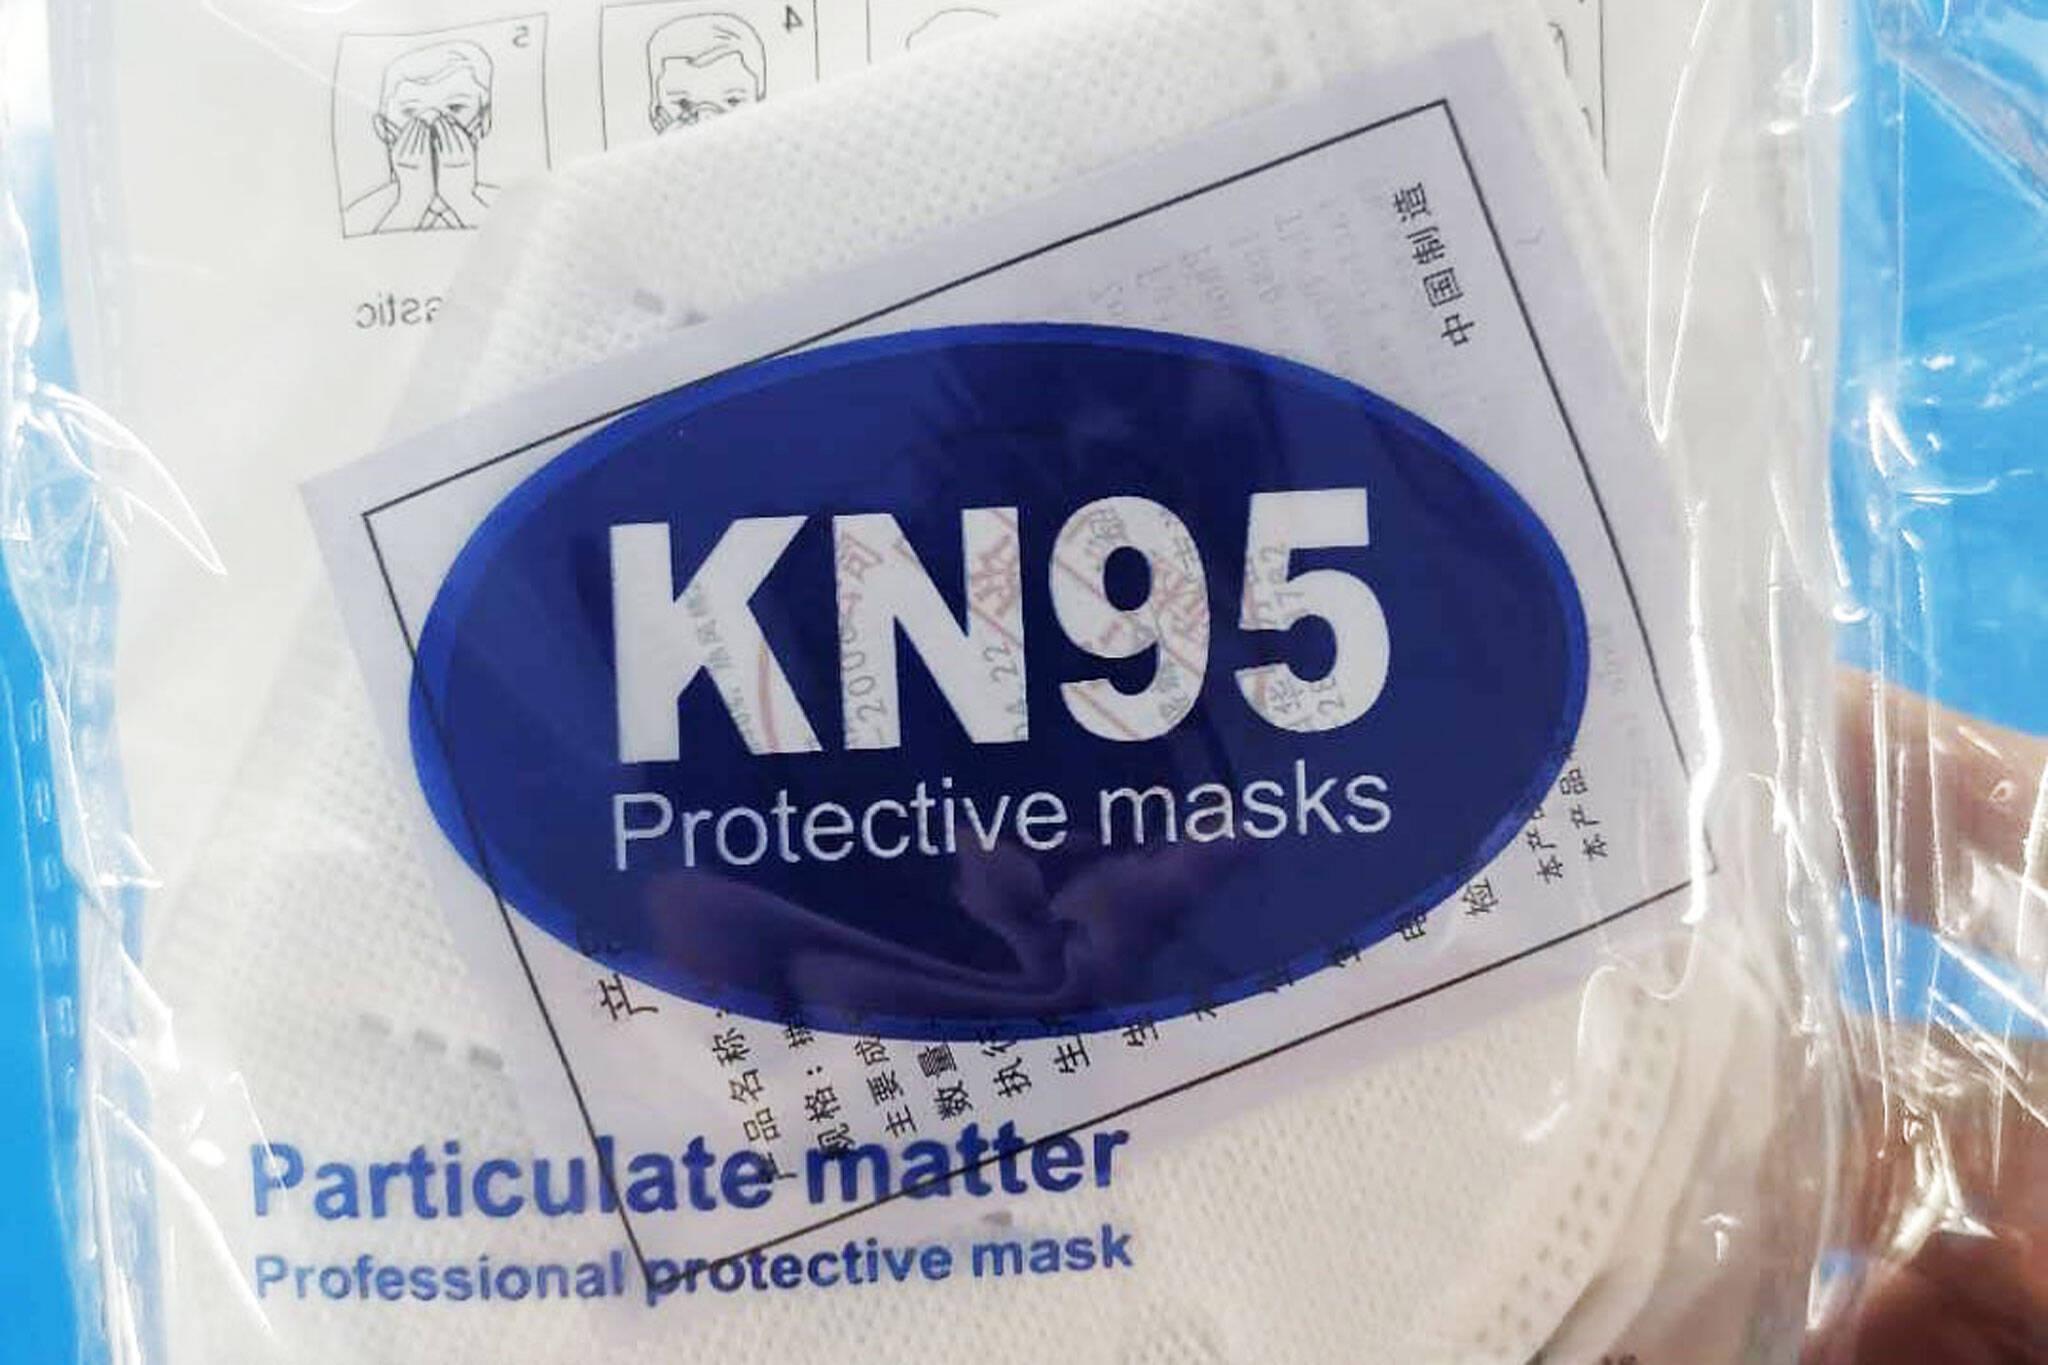 kn95 mask recall